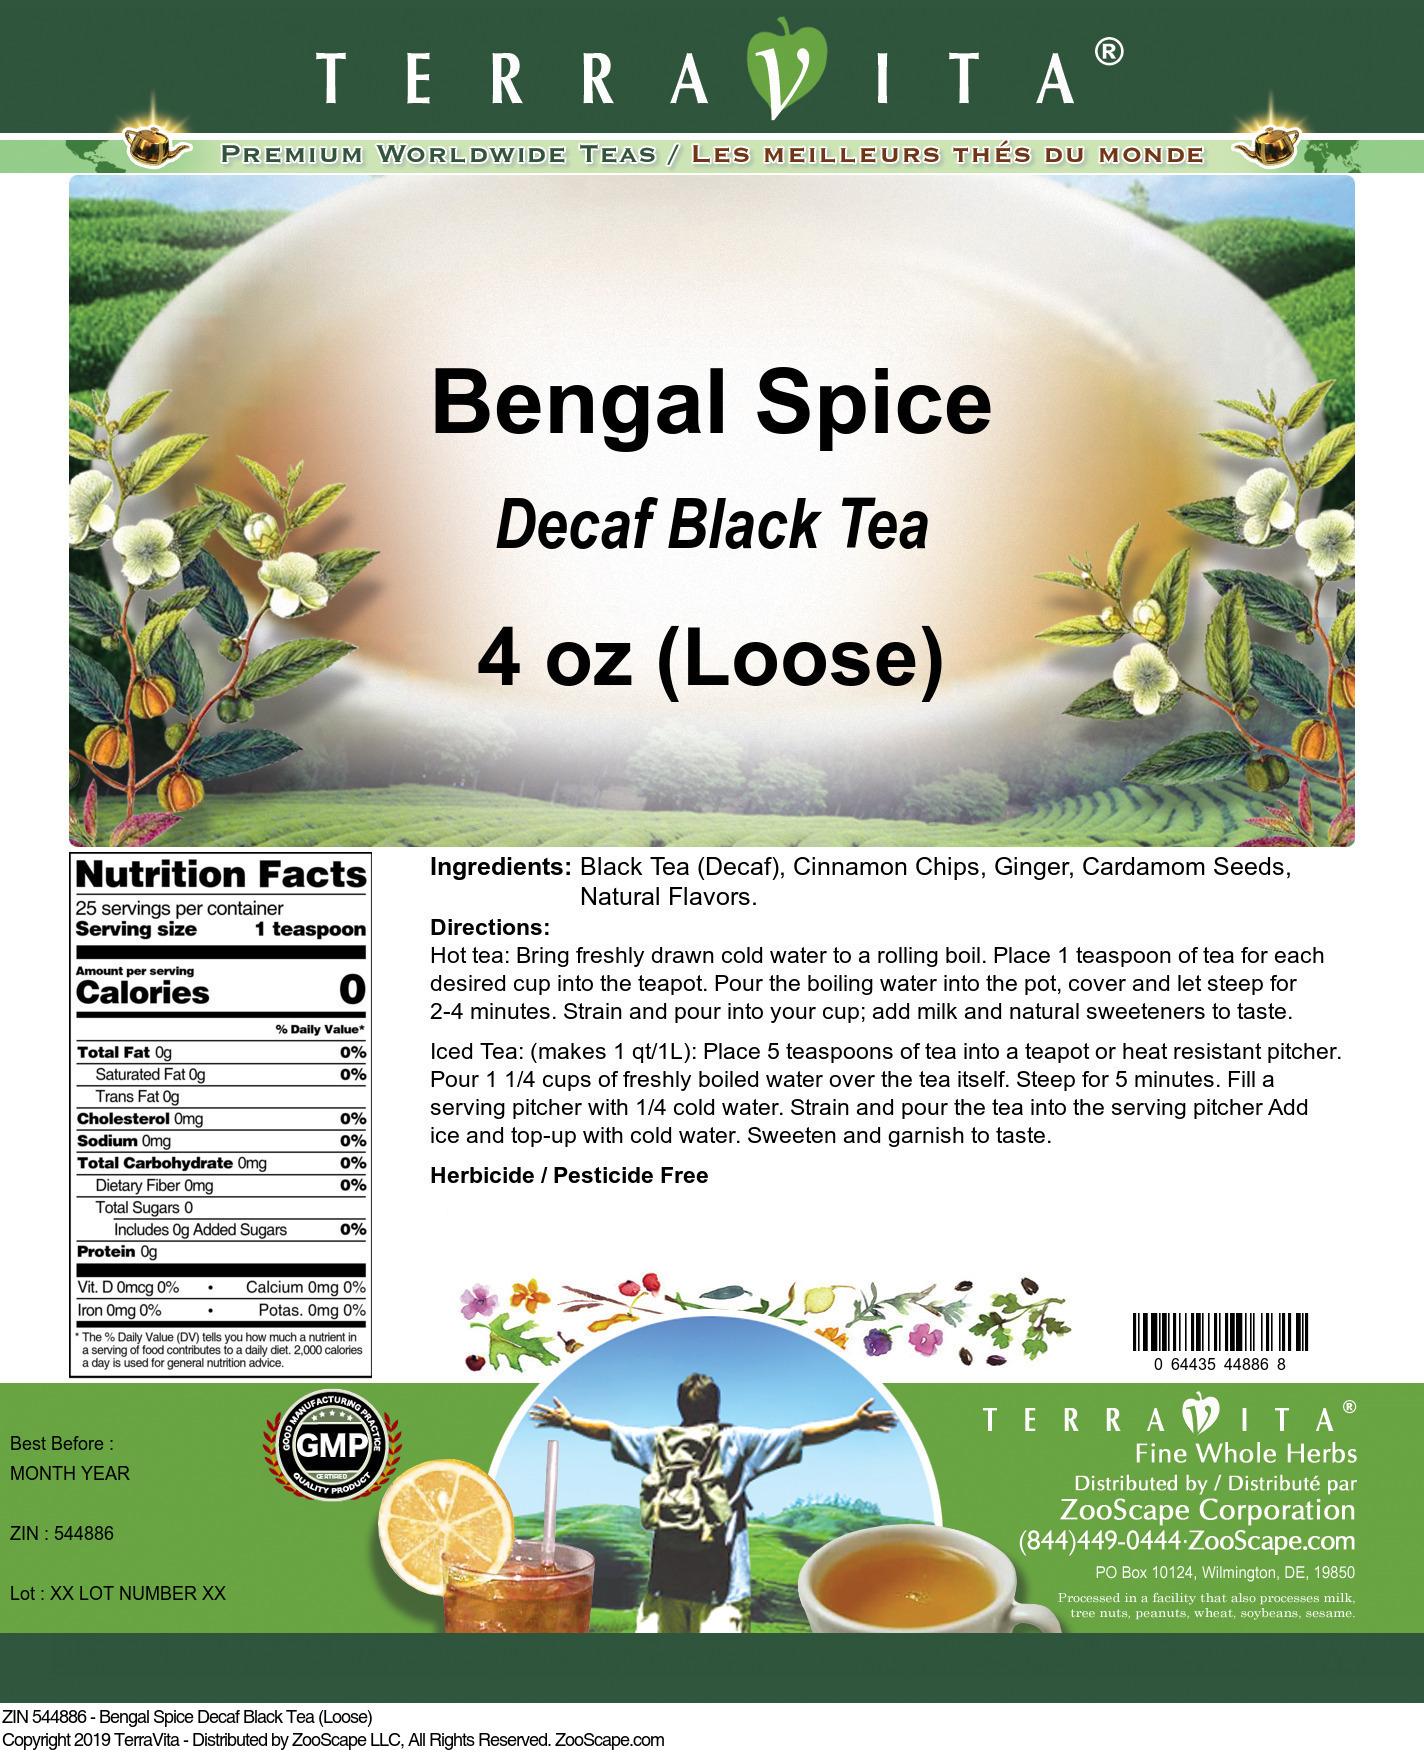 Bengal Spice Decaf Black Tea